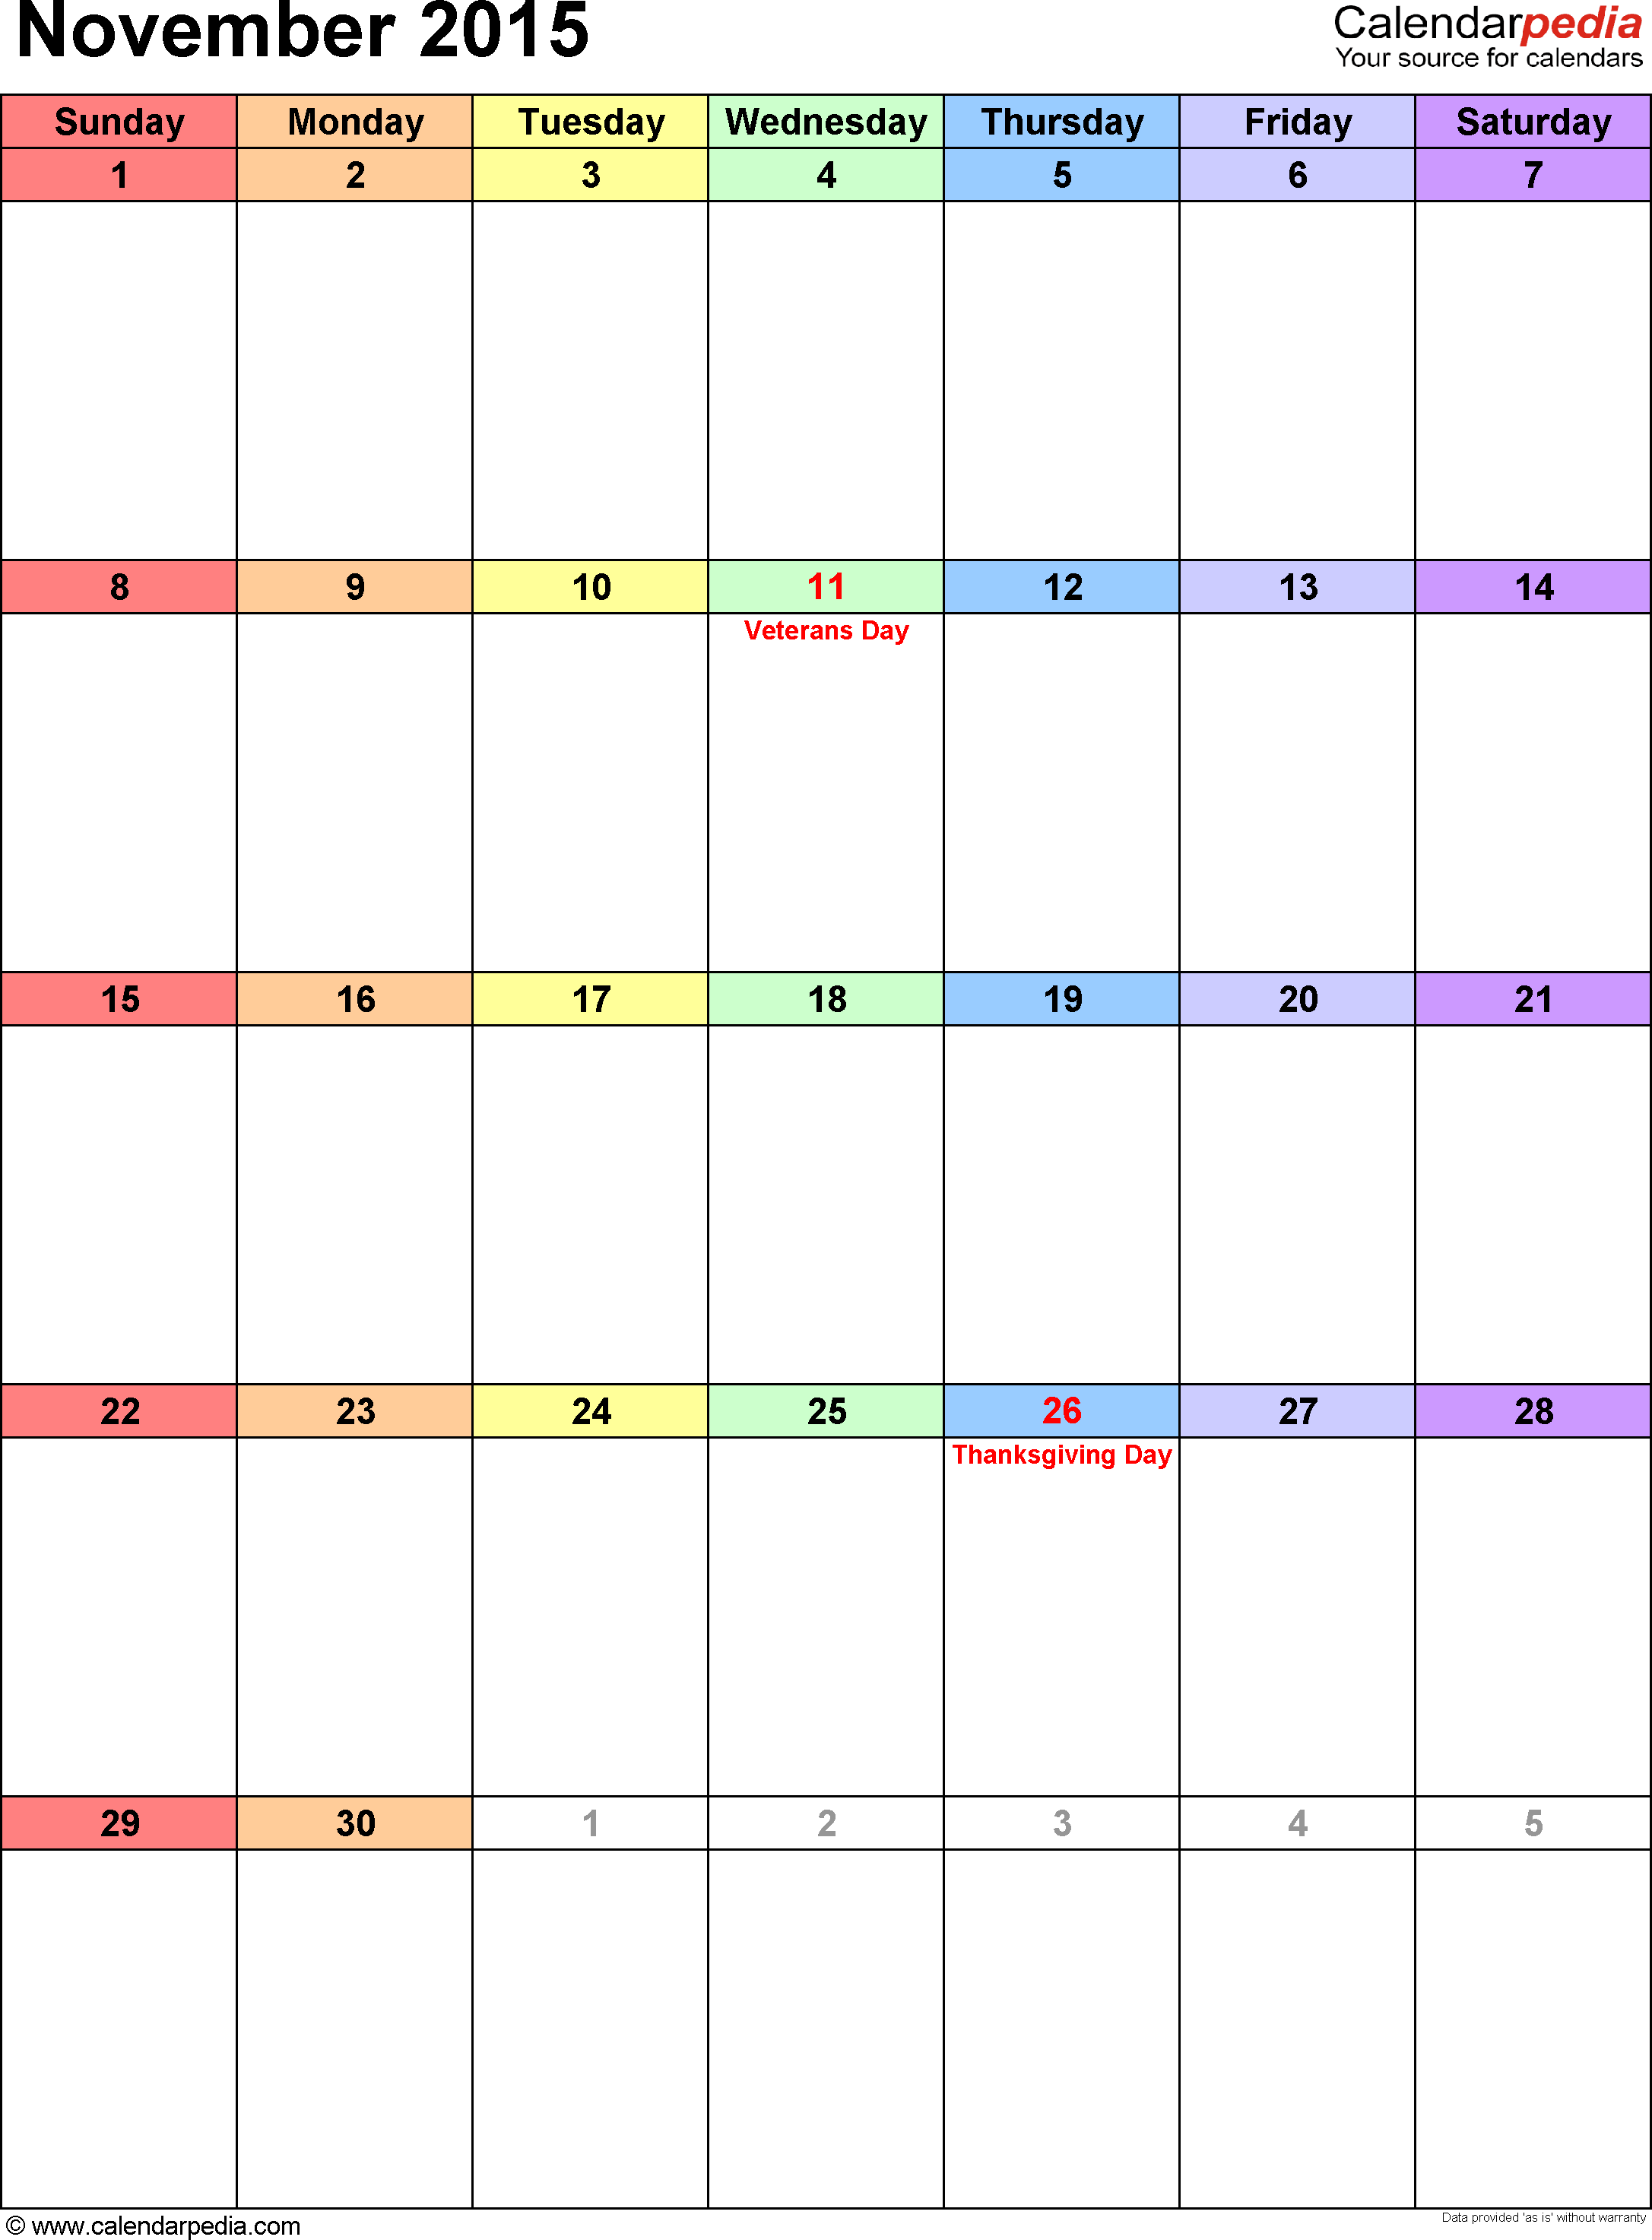 November 2015 calendar as printable Word, Excel & PDF templates